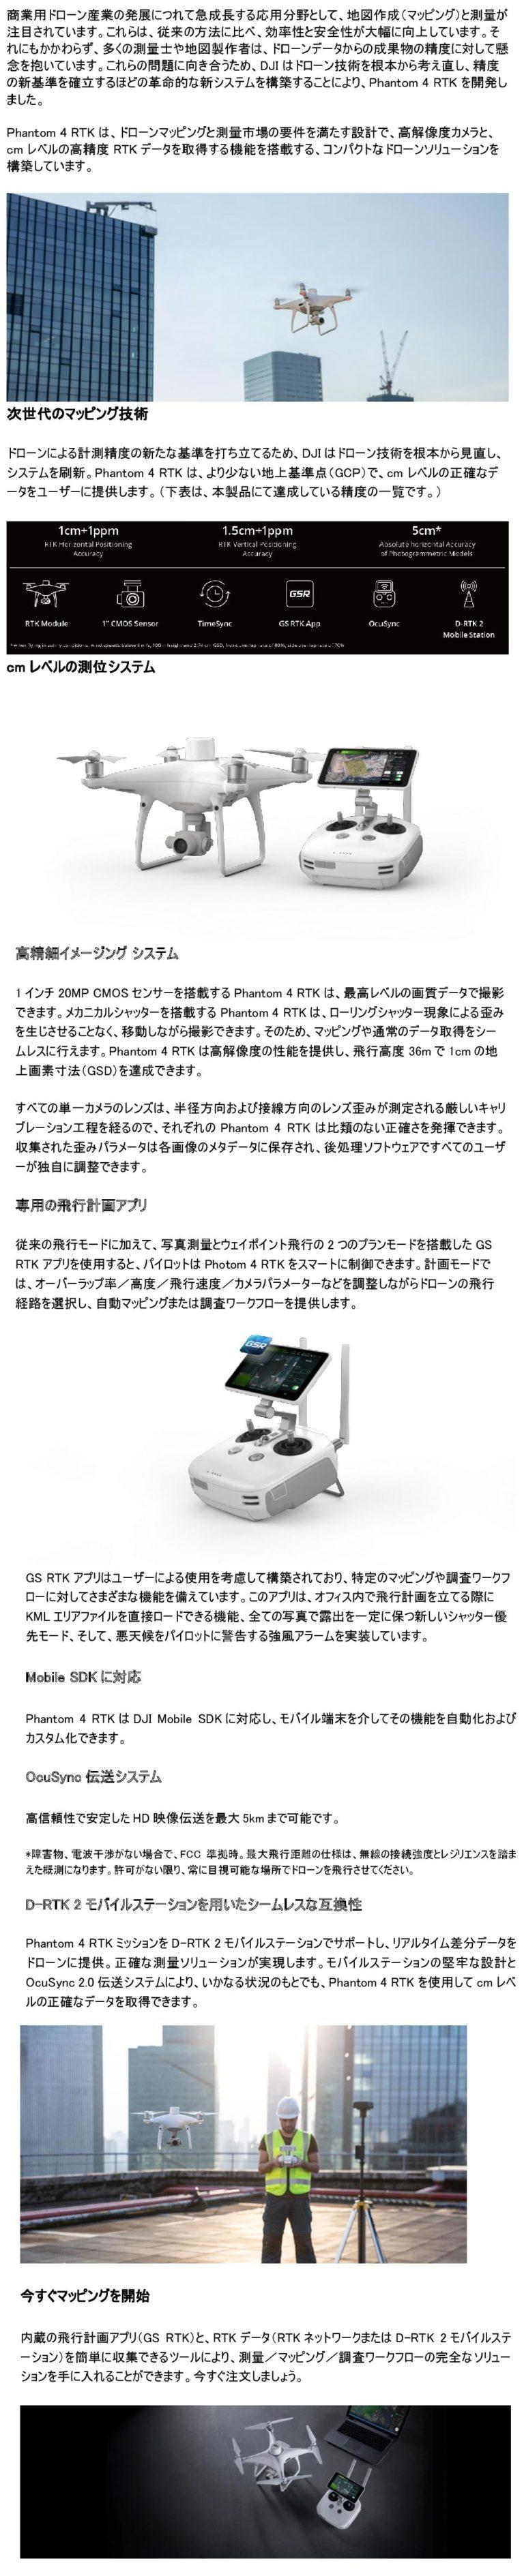 DJI Phantom4 RTK +D-RTK 2 モバイルステーション